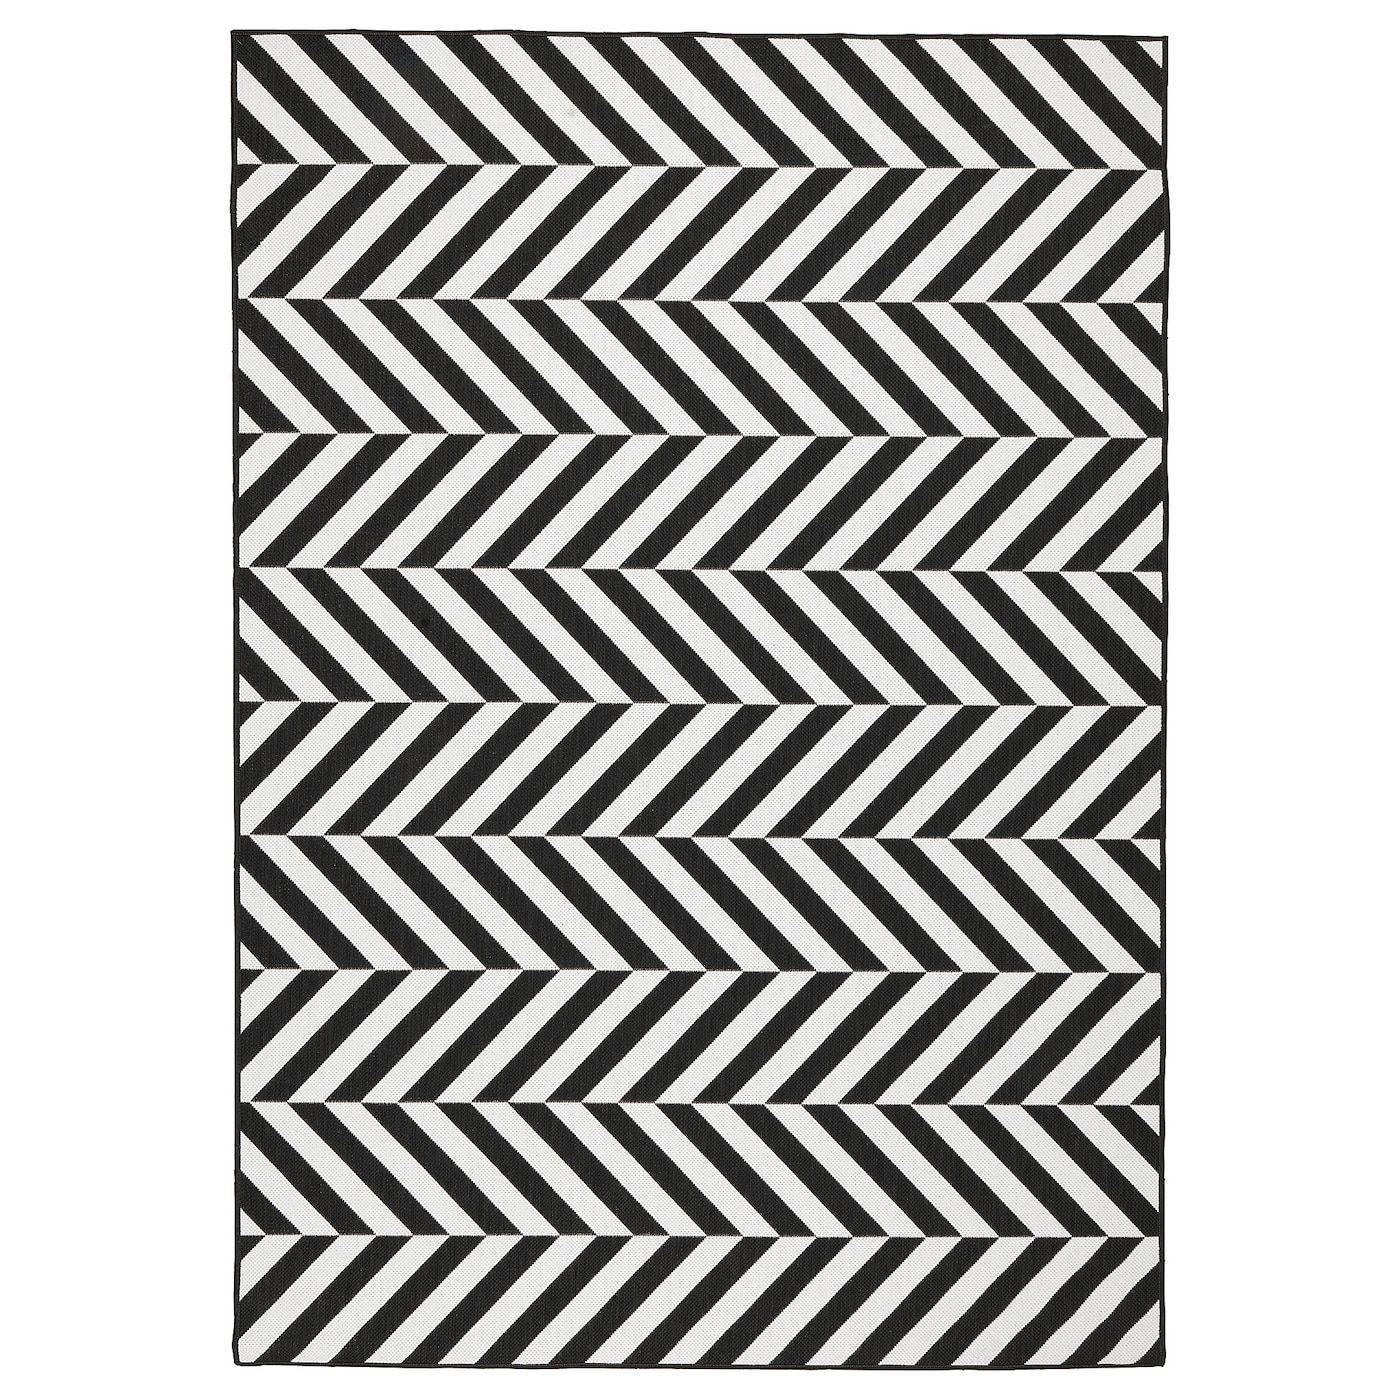 Skarrild Tapis Tisse A Plat Int Exterieur Blanc Noir 160x230 Cm Tapis Tisse Tapis Exterieur Tapis